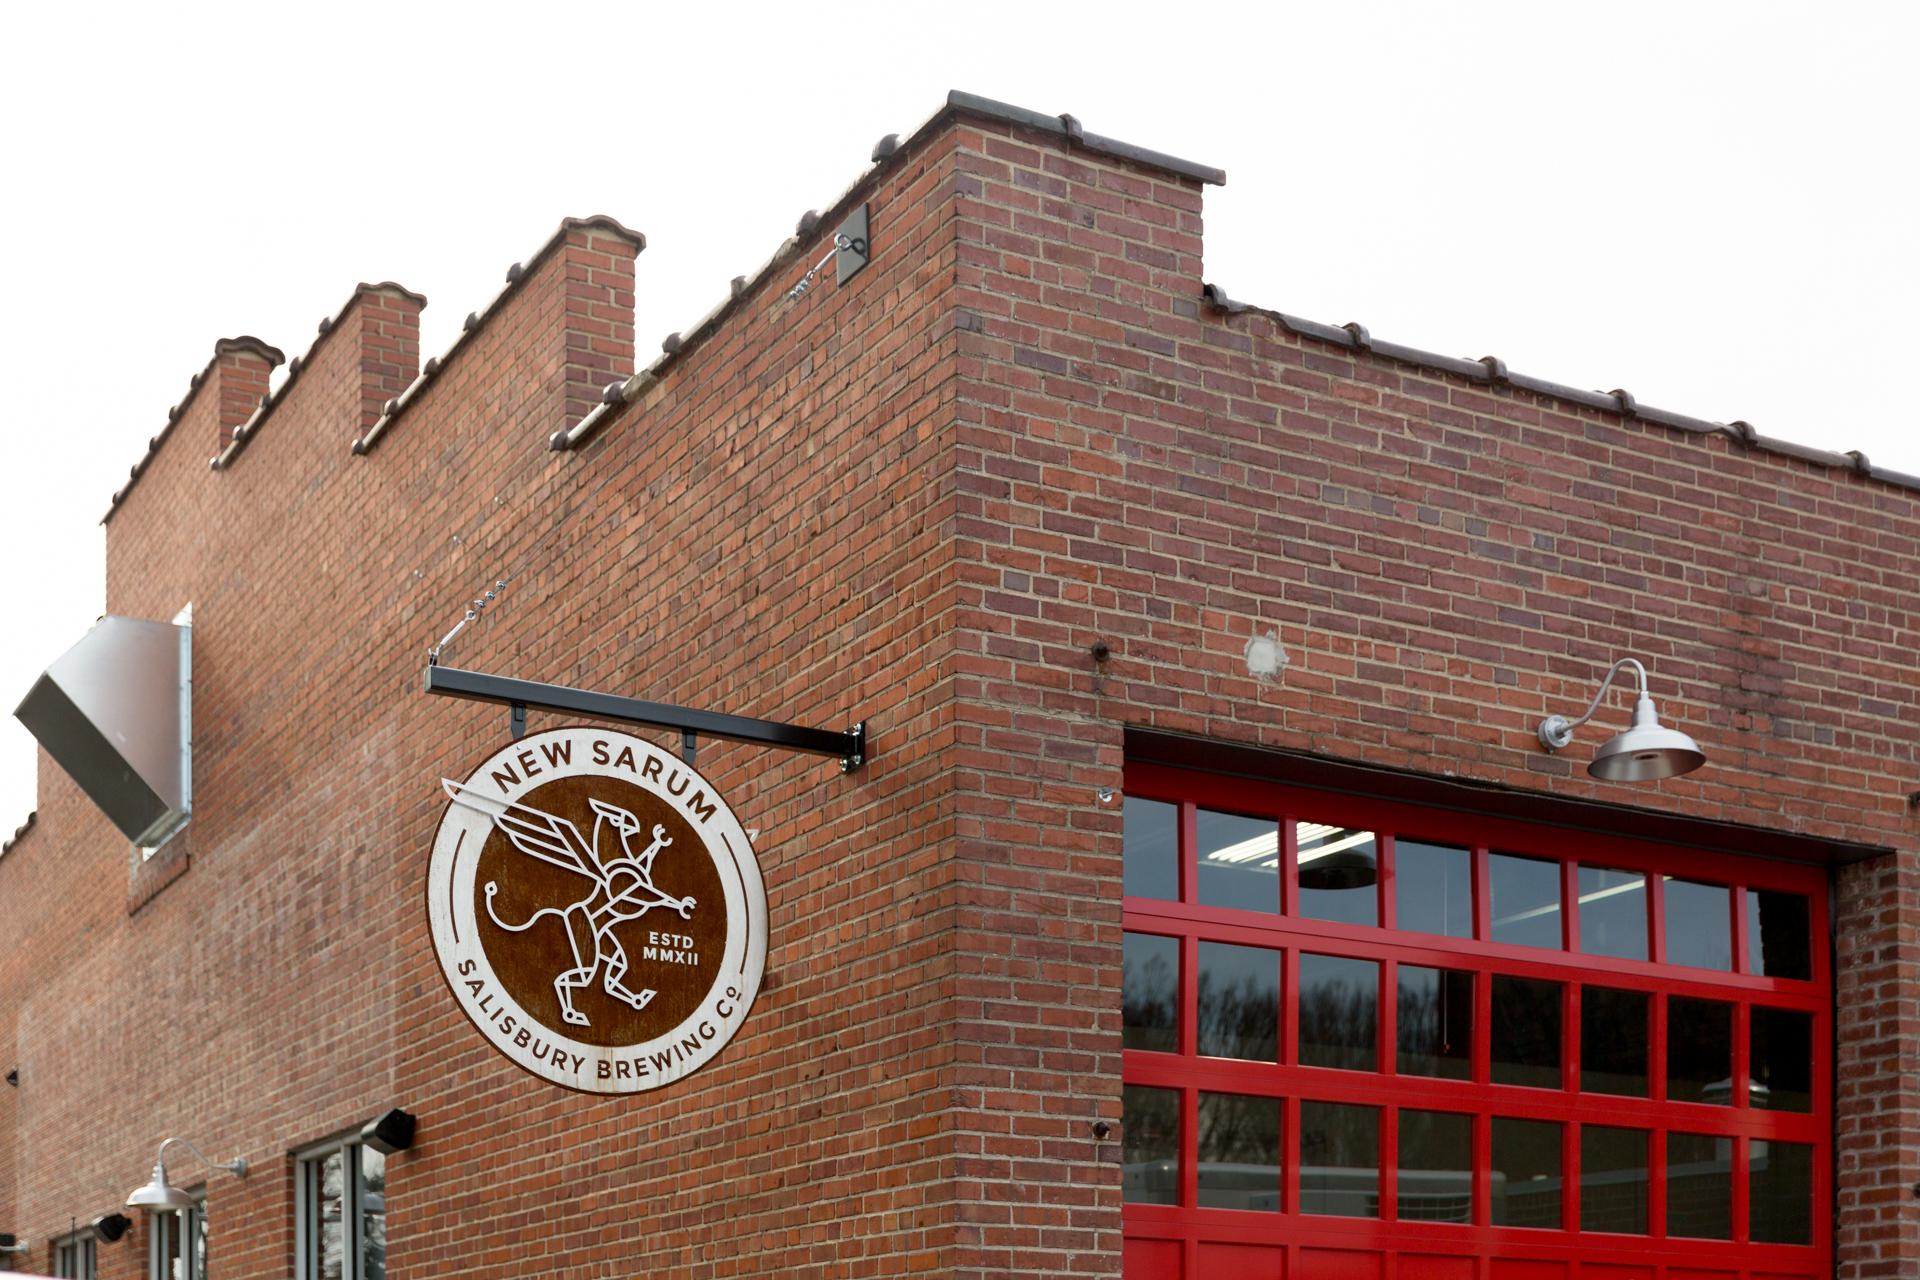 26-industries-fabrication-portfolio-new-sarum-brewery-01-1.jpg